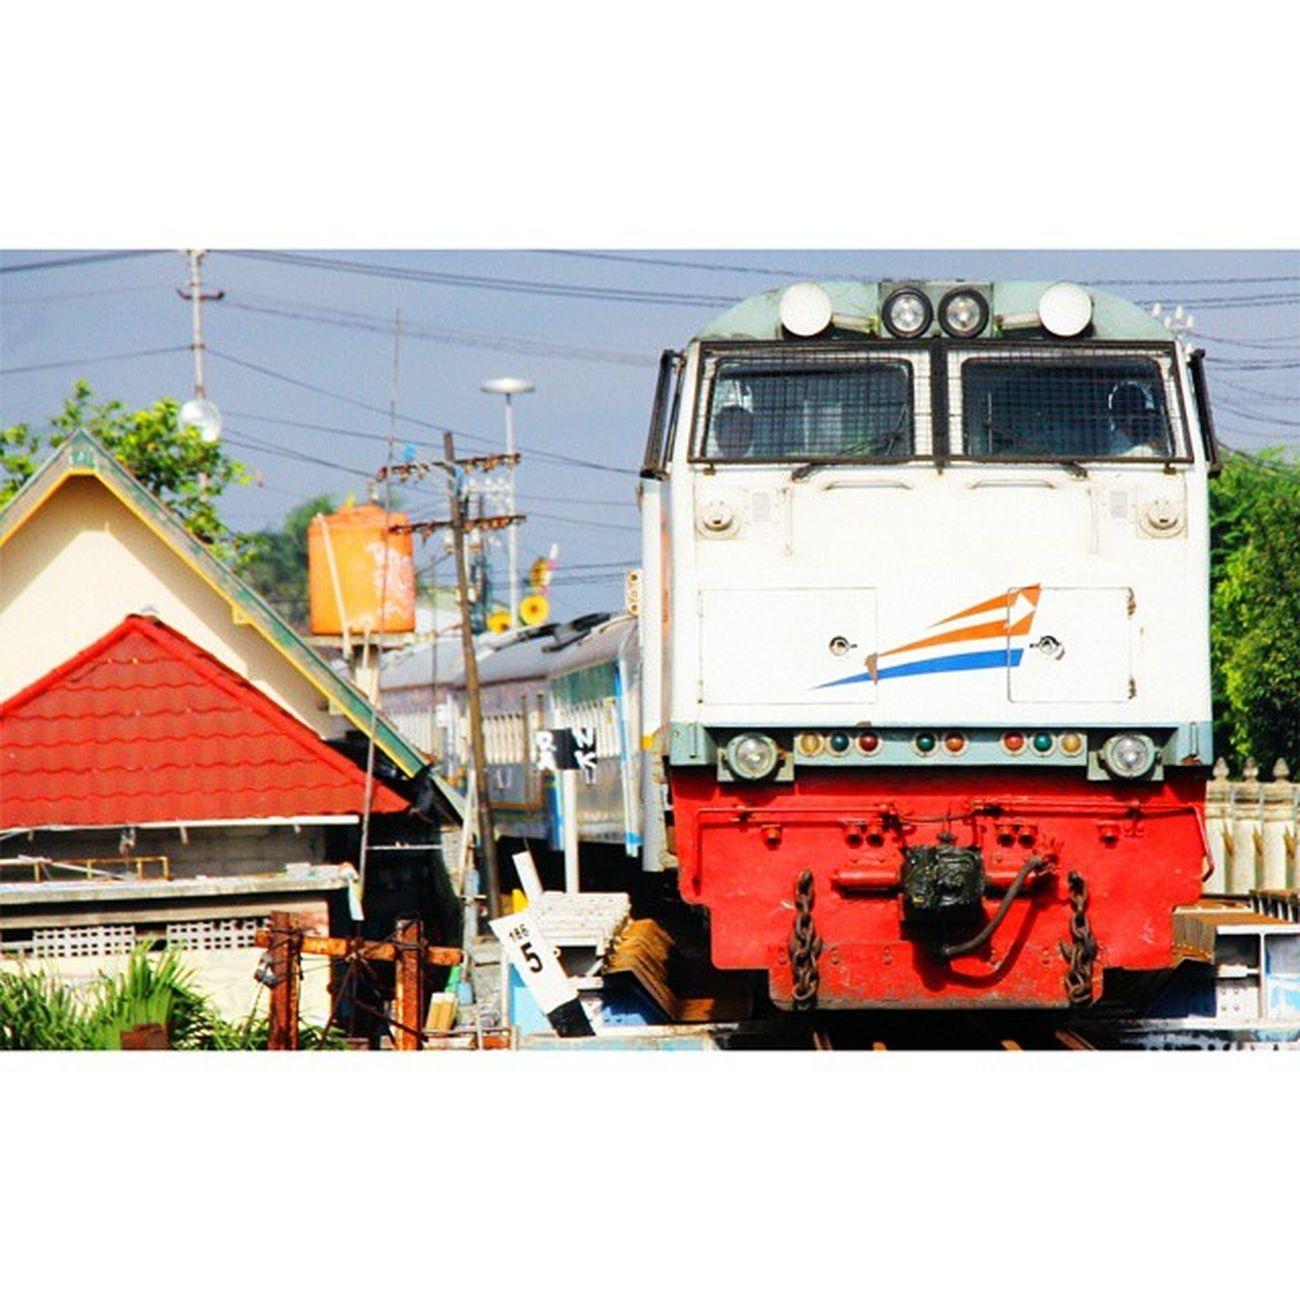 KA MALIOBORO EKSPRES (YOGYAKARTA - MALANG PP) Railwayphotography Railfans Rail Spoor kereta keretaapi keretaapikita photography yogyakarta instagram